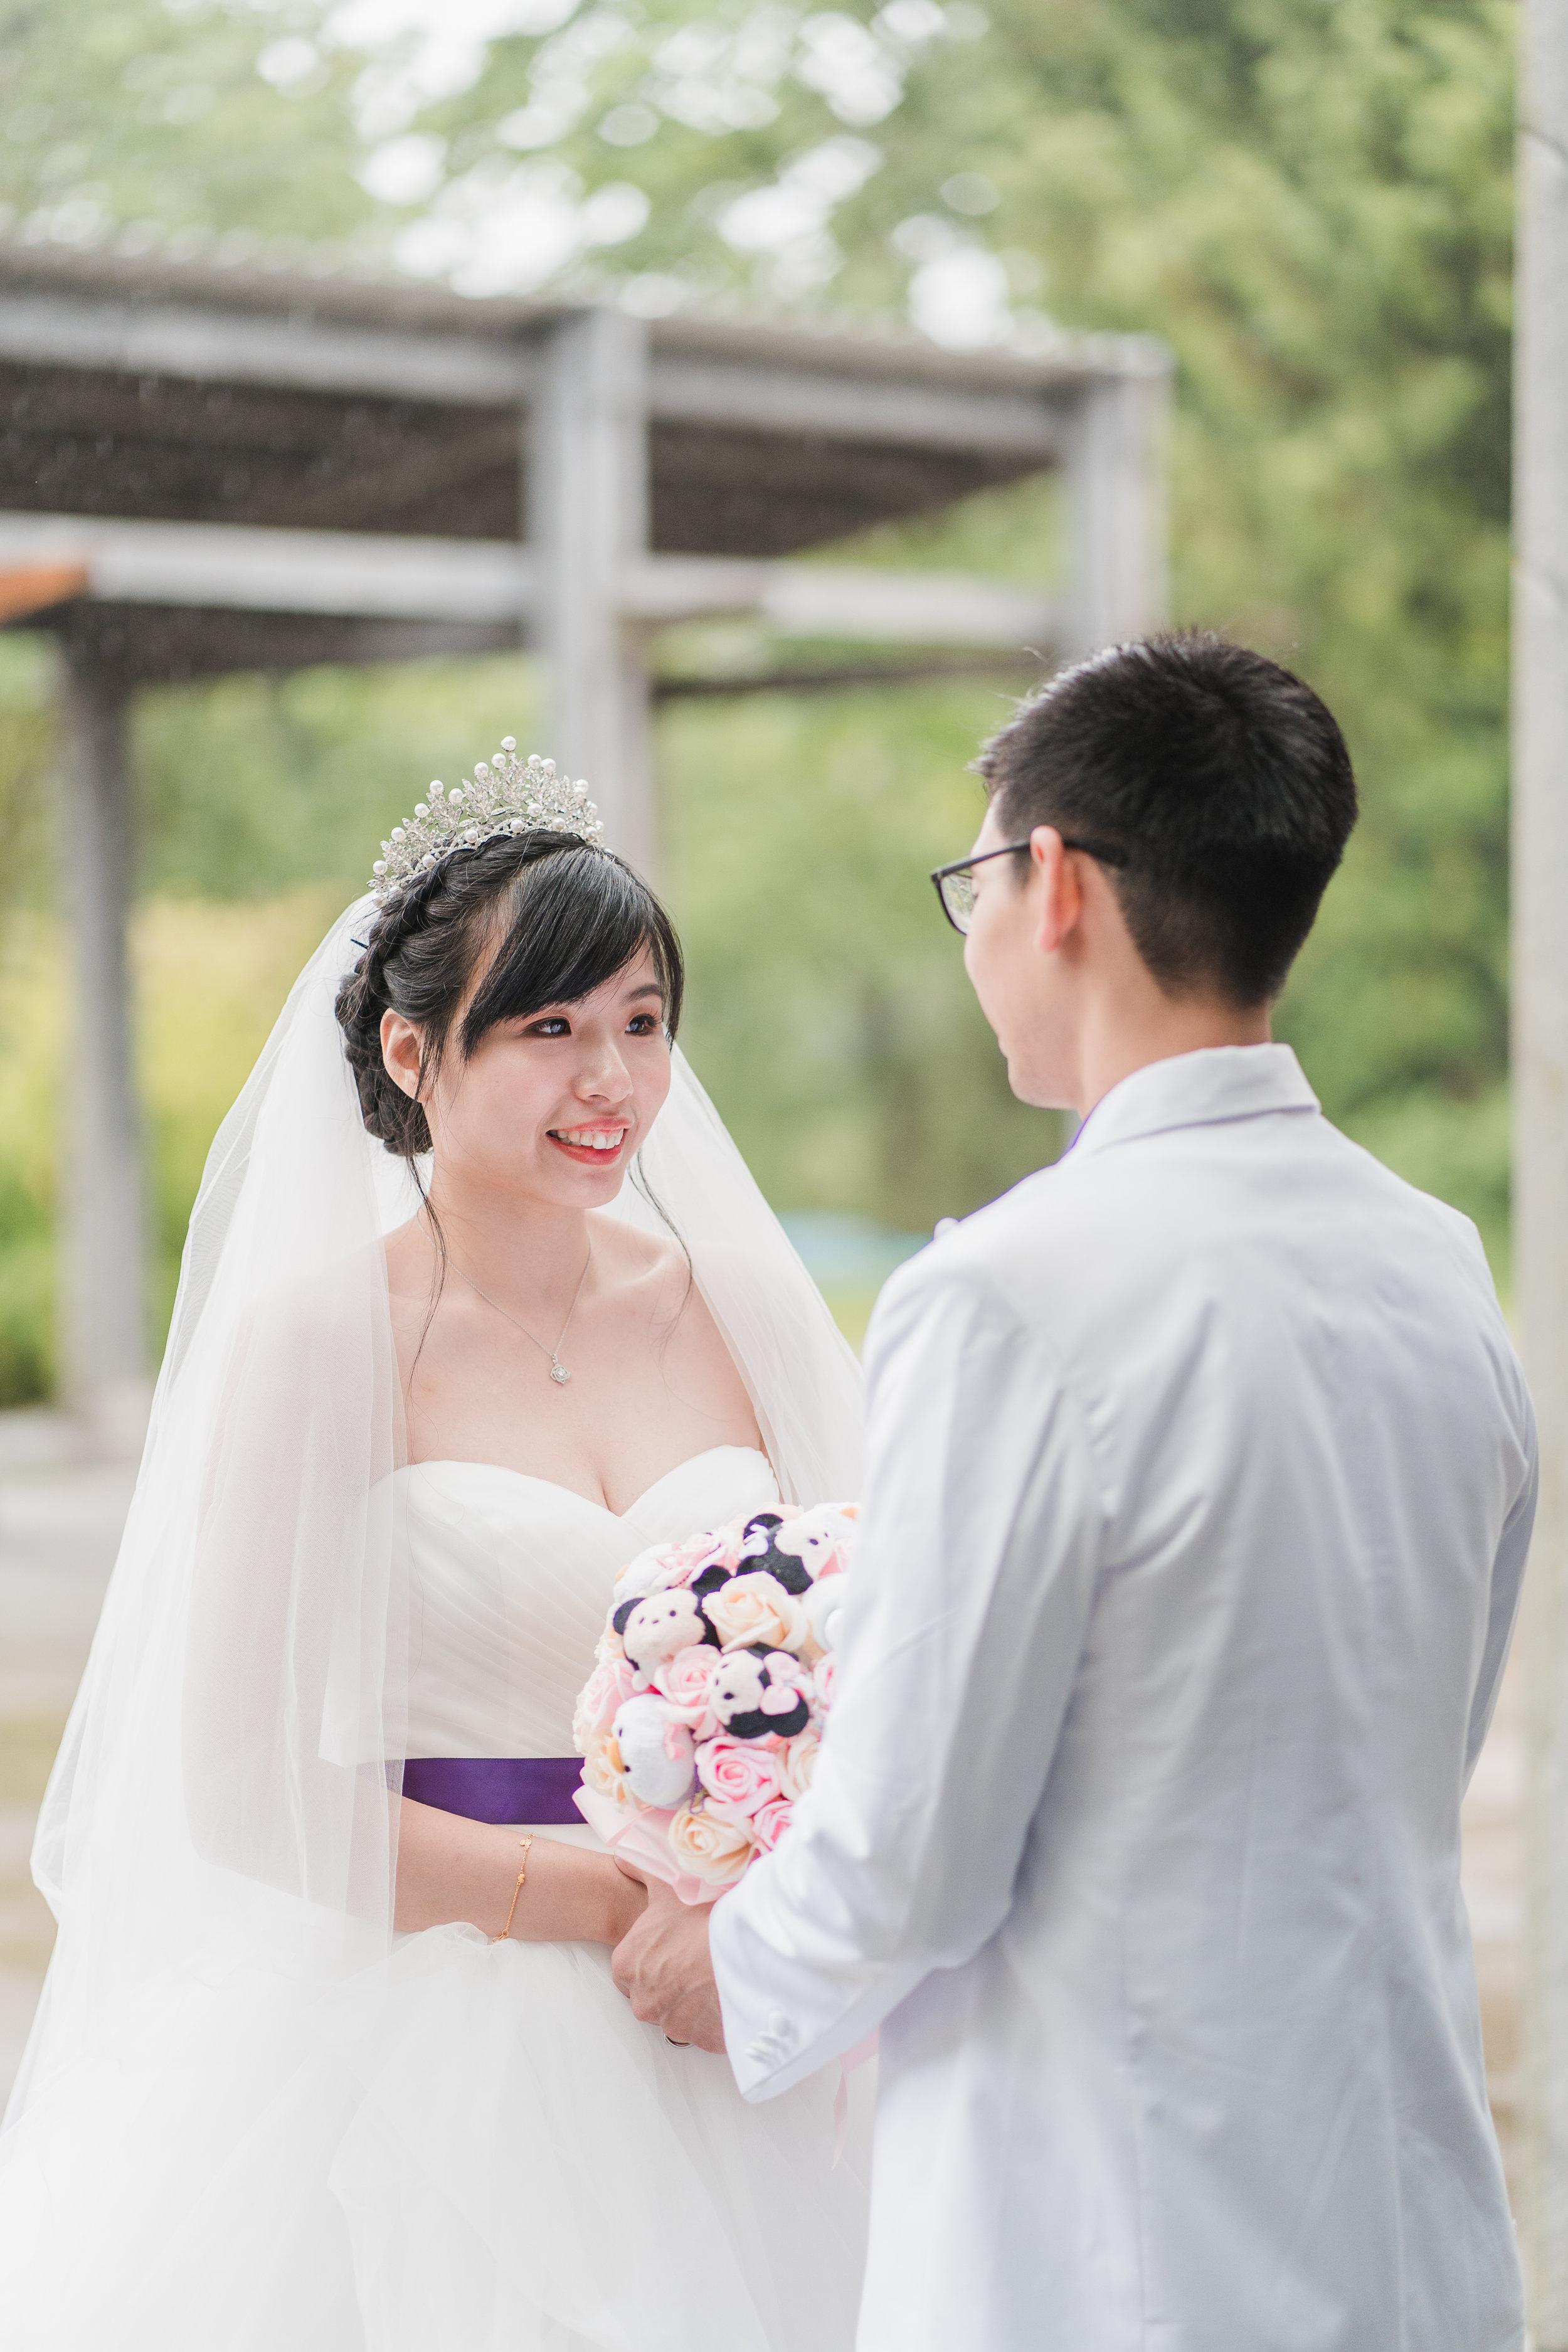 20190520 - Pamela & Matthew Wedding - 0207.jpg